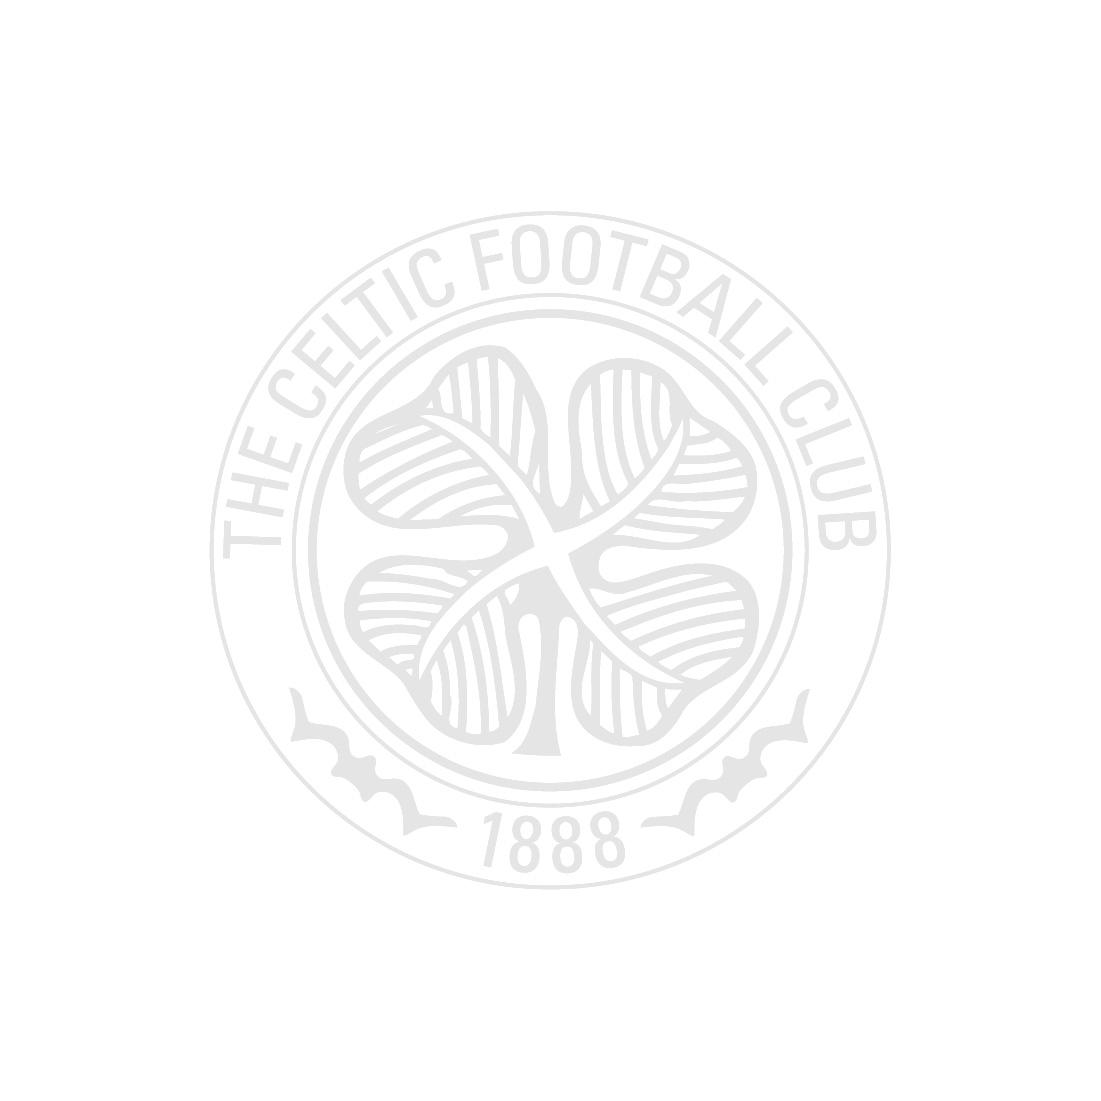 Celtic Ladies Oversized 1888 Hoodie